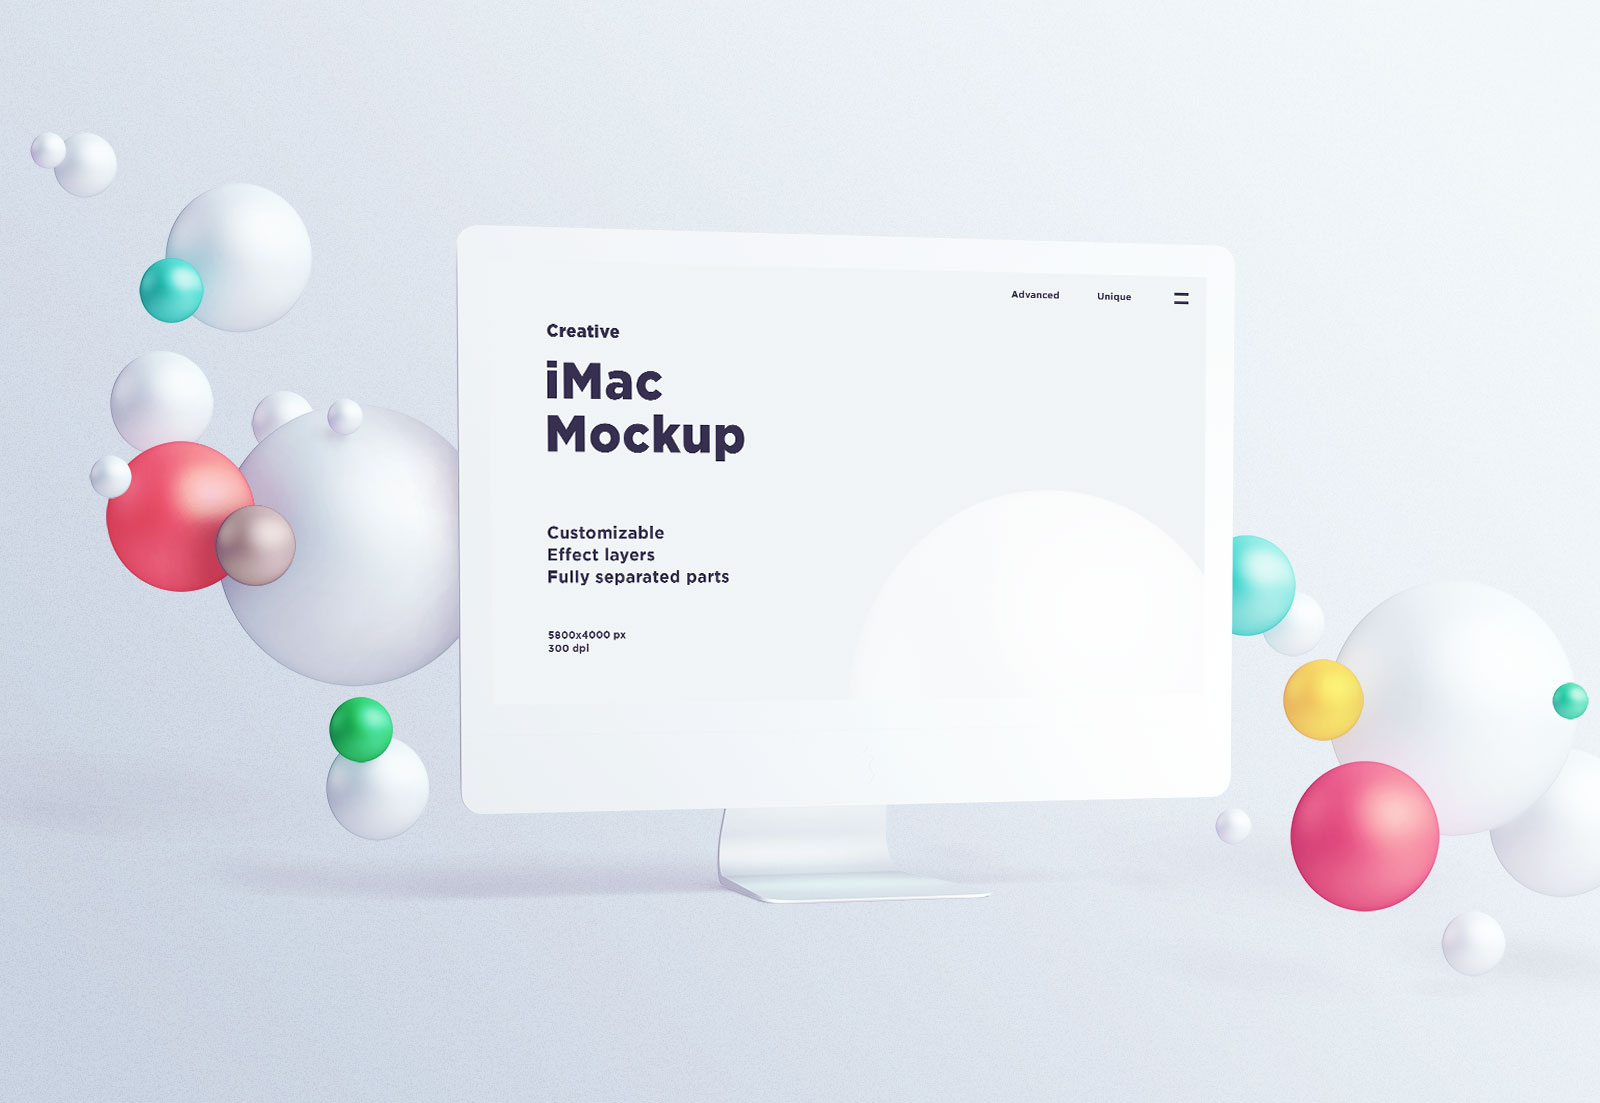 Free-Fully-Customizable-iMac-Mockup-PSD-2